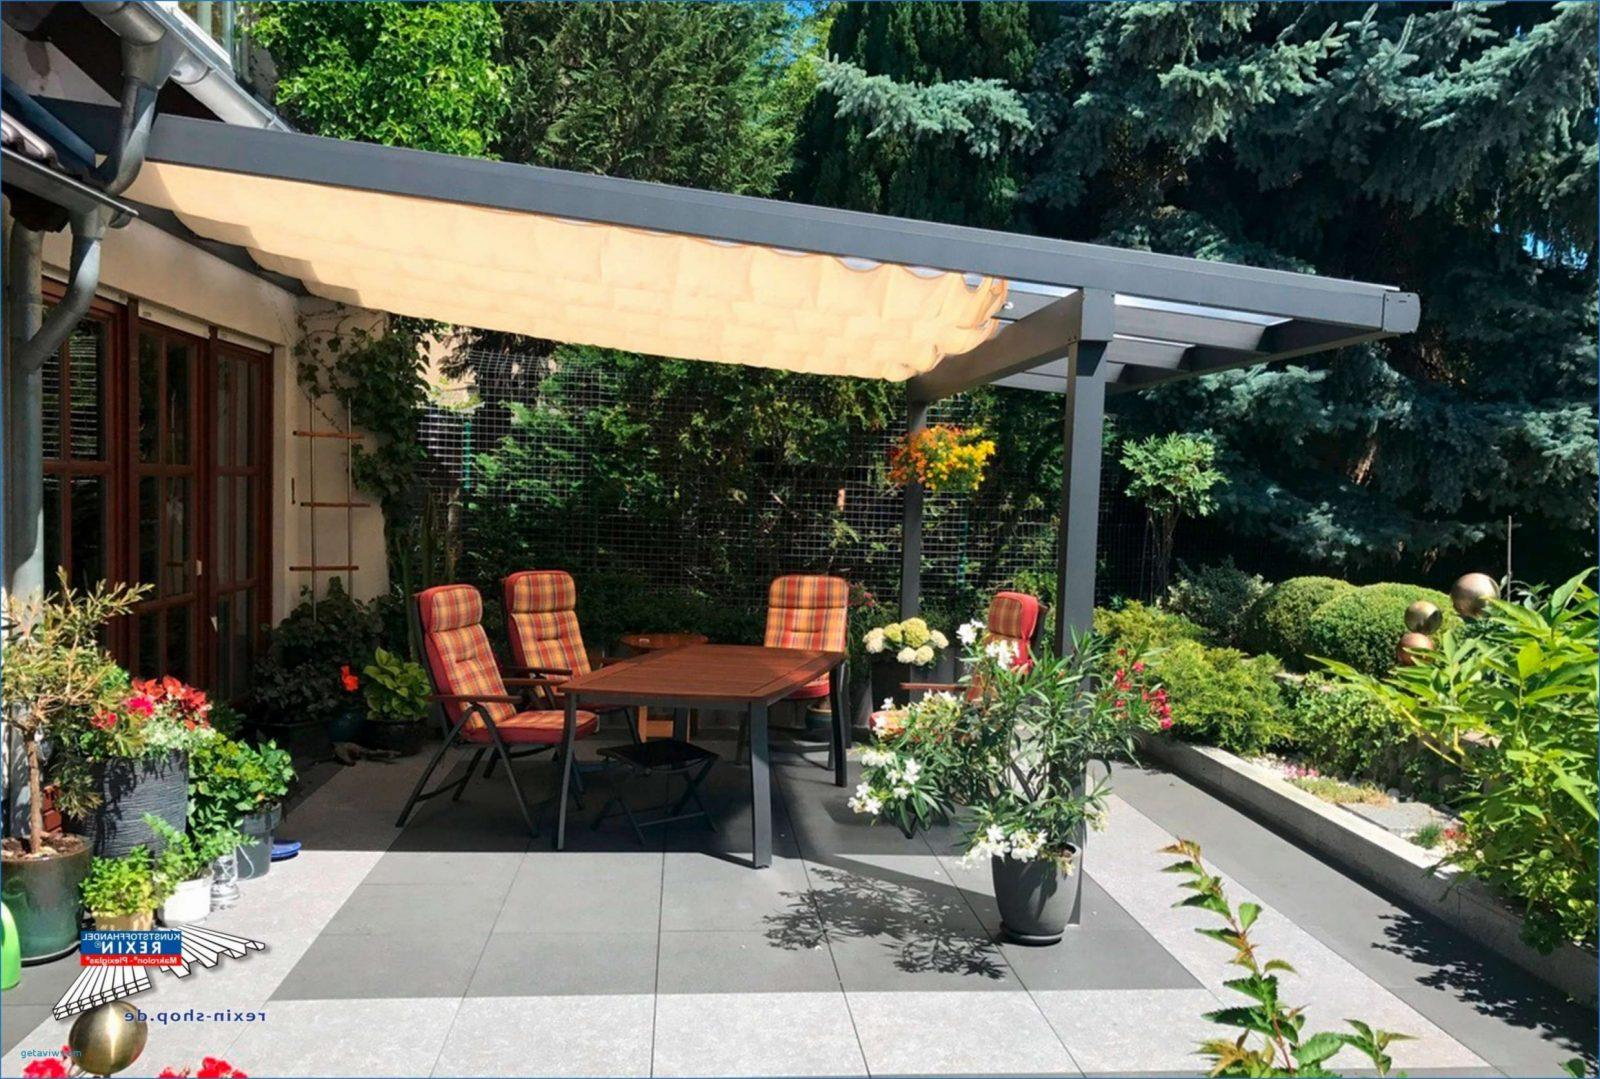 Pergola Selber Bauen Designideen Von Garten Terrasse Anlegen von Pergola Selber Bauen Terrasse Bild